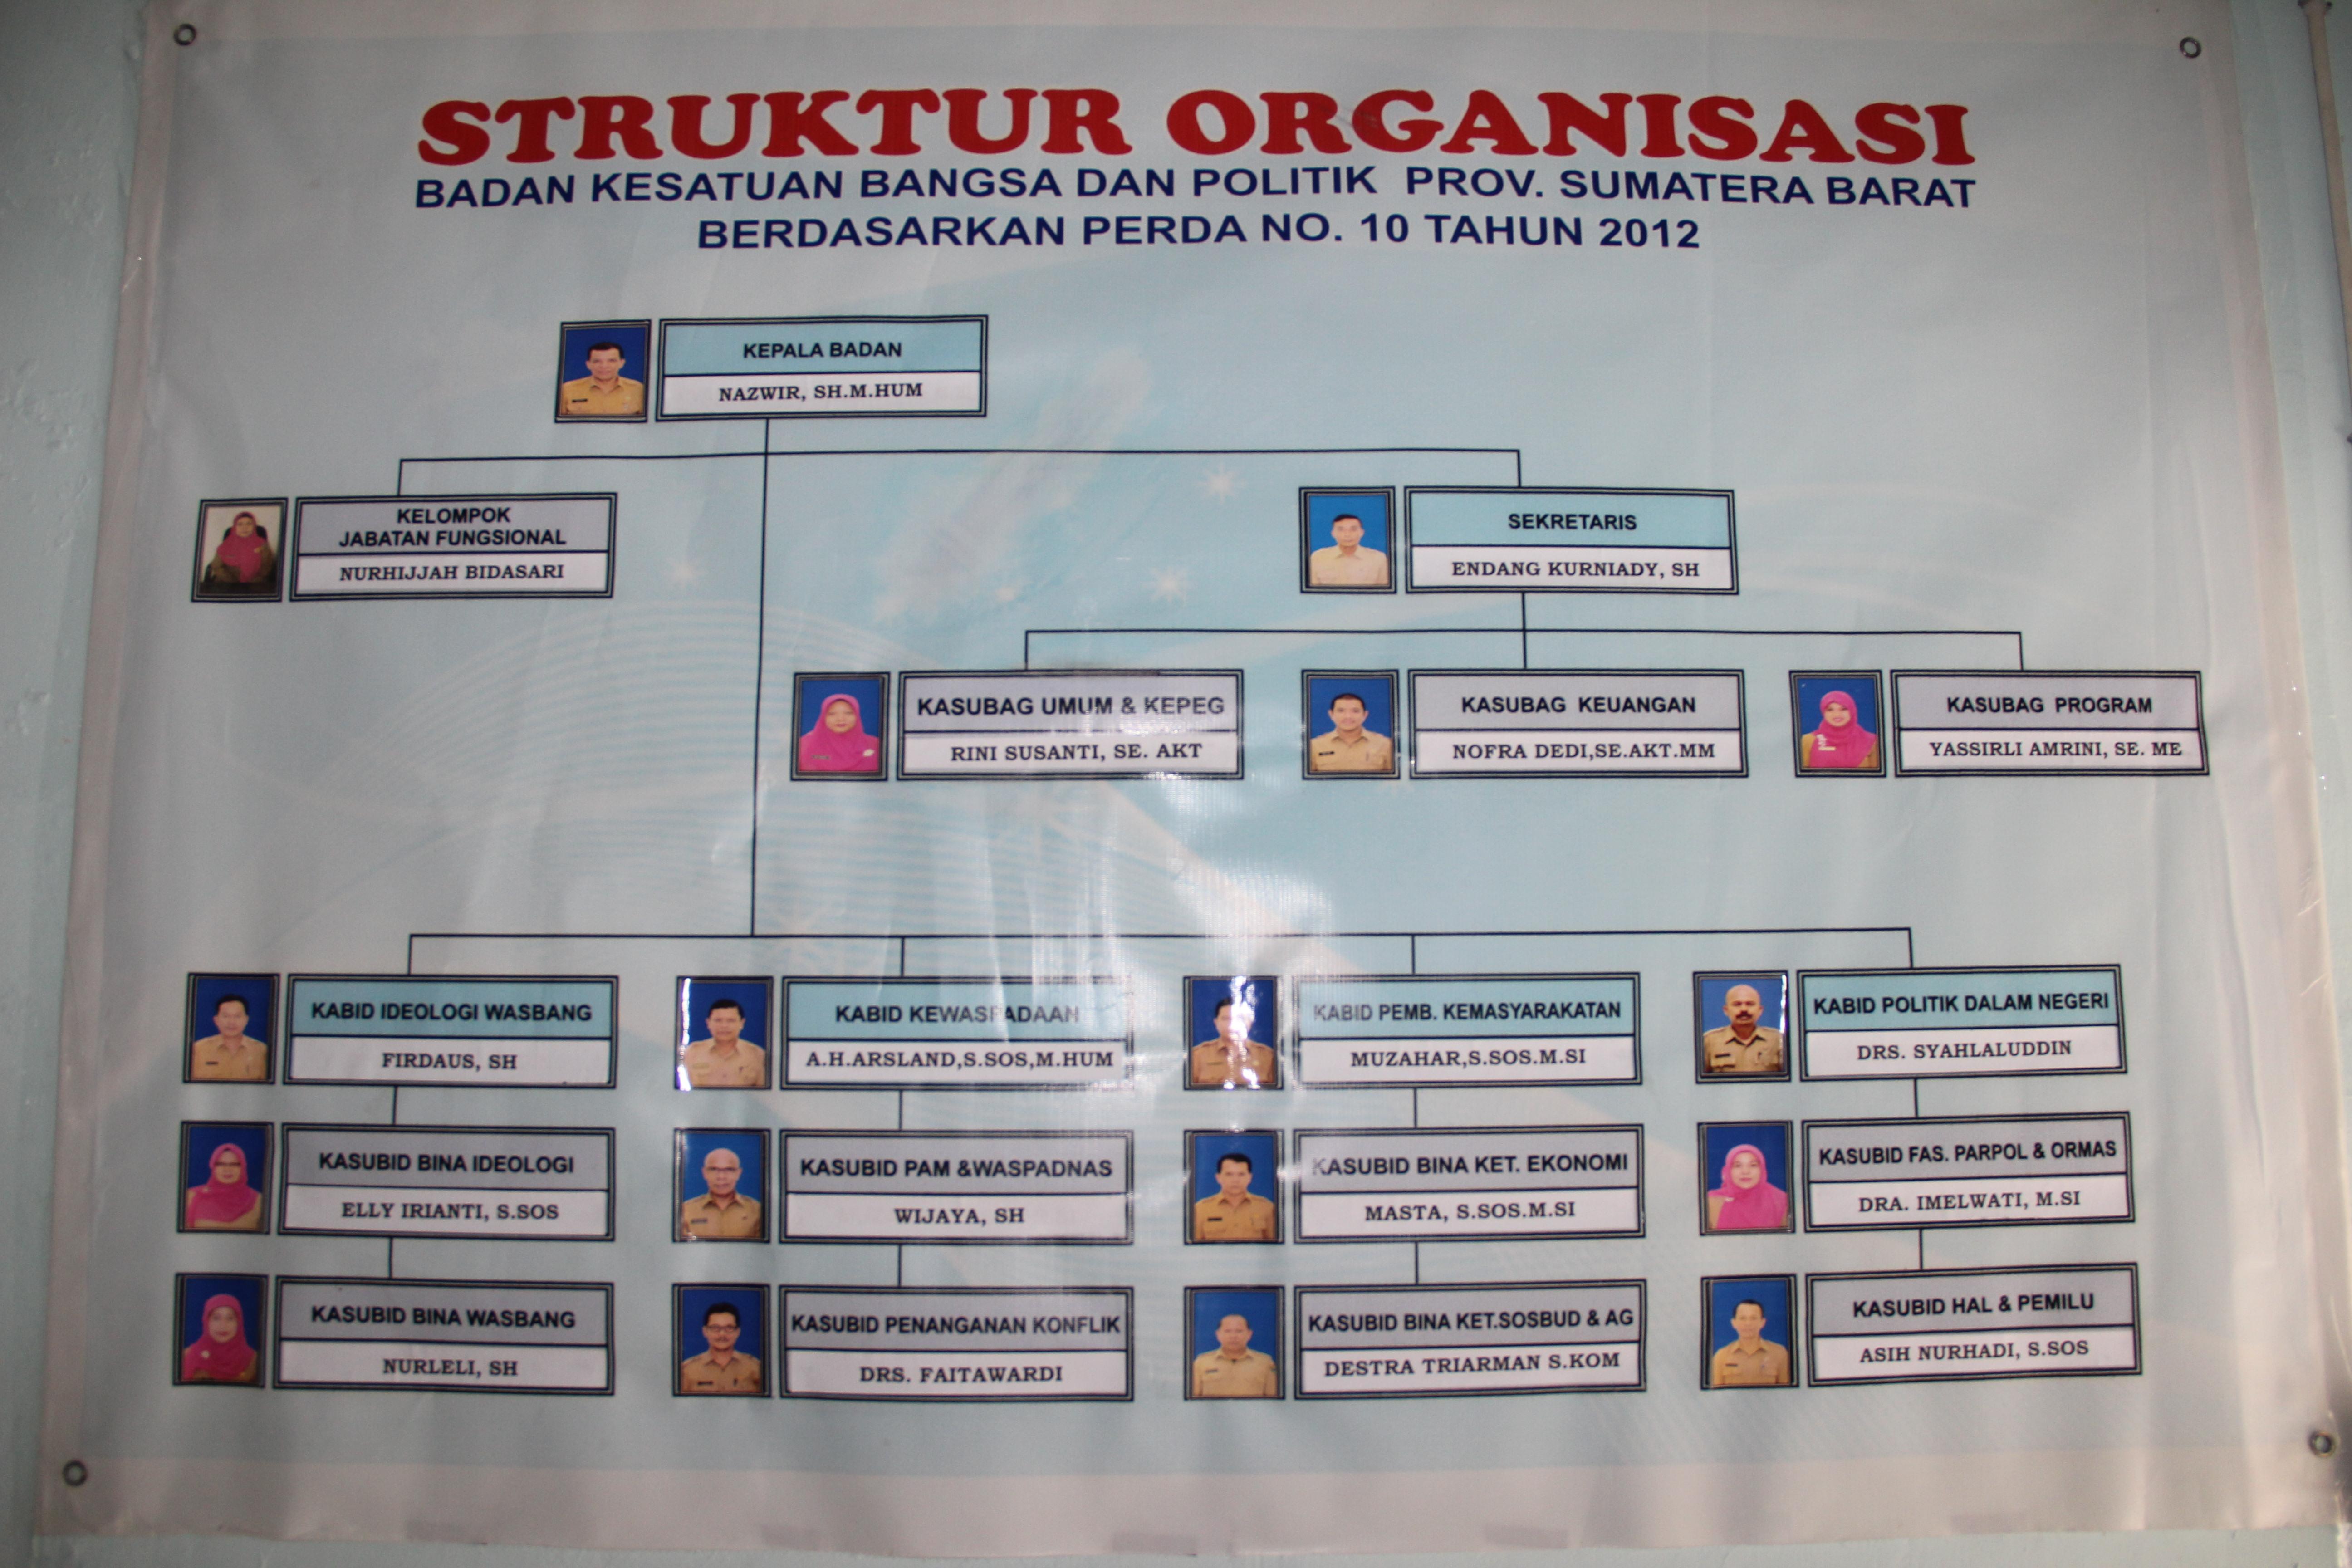 Struktur Organisasi Badan Kesbangpol Prov. Sumbar